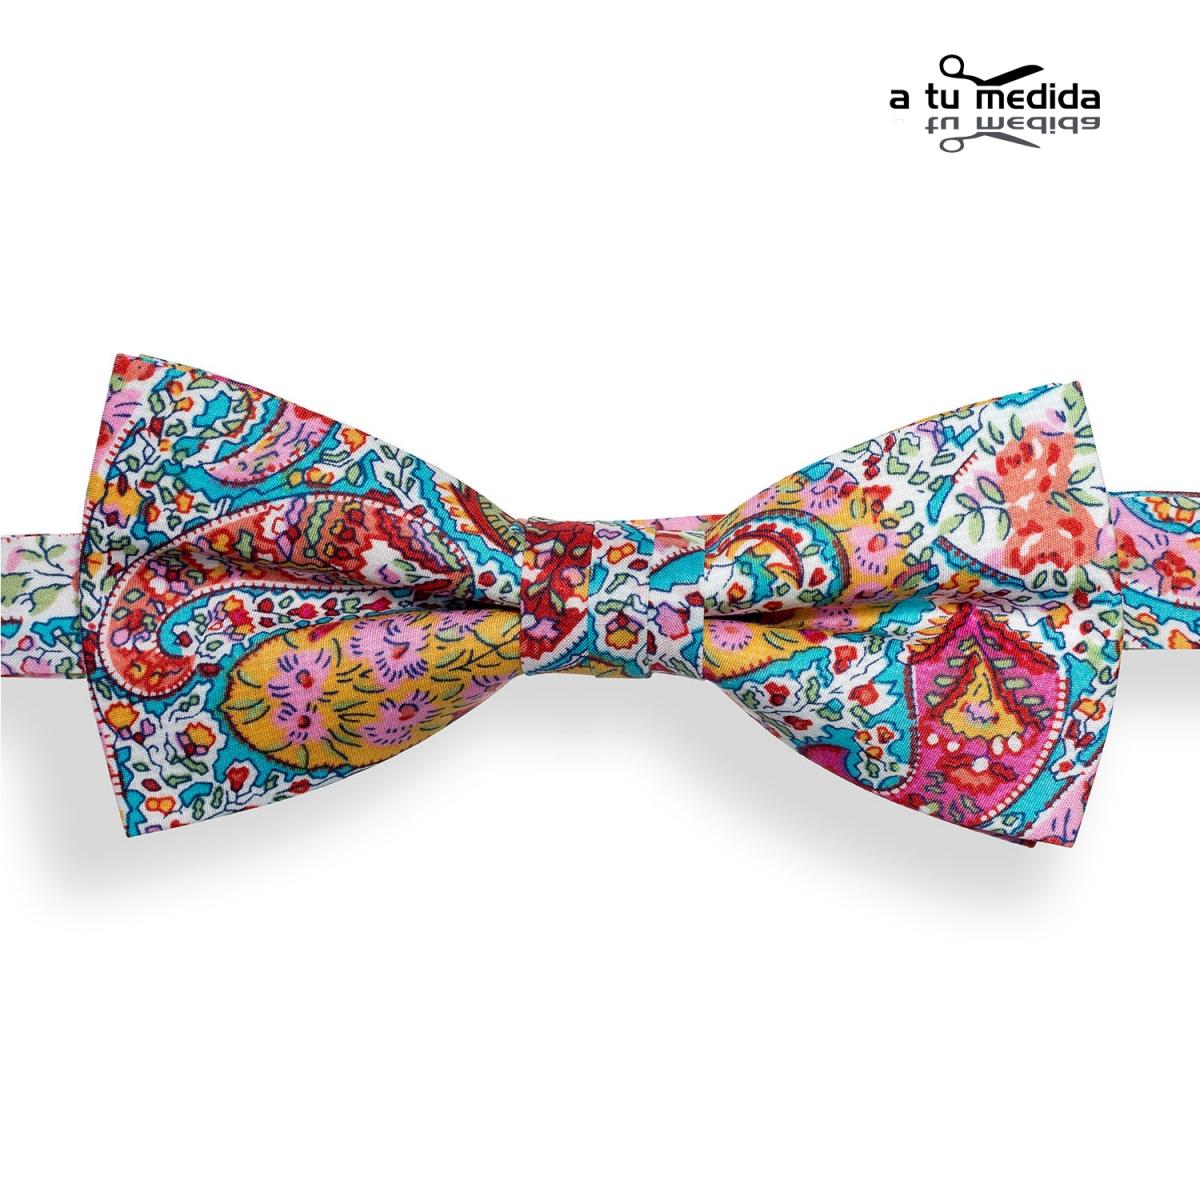 Pajarita-Turquesa-Dibujos-Multicolor